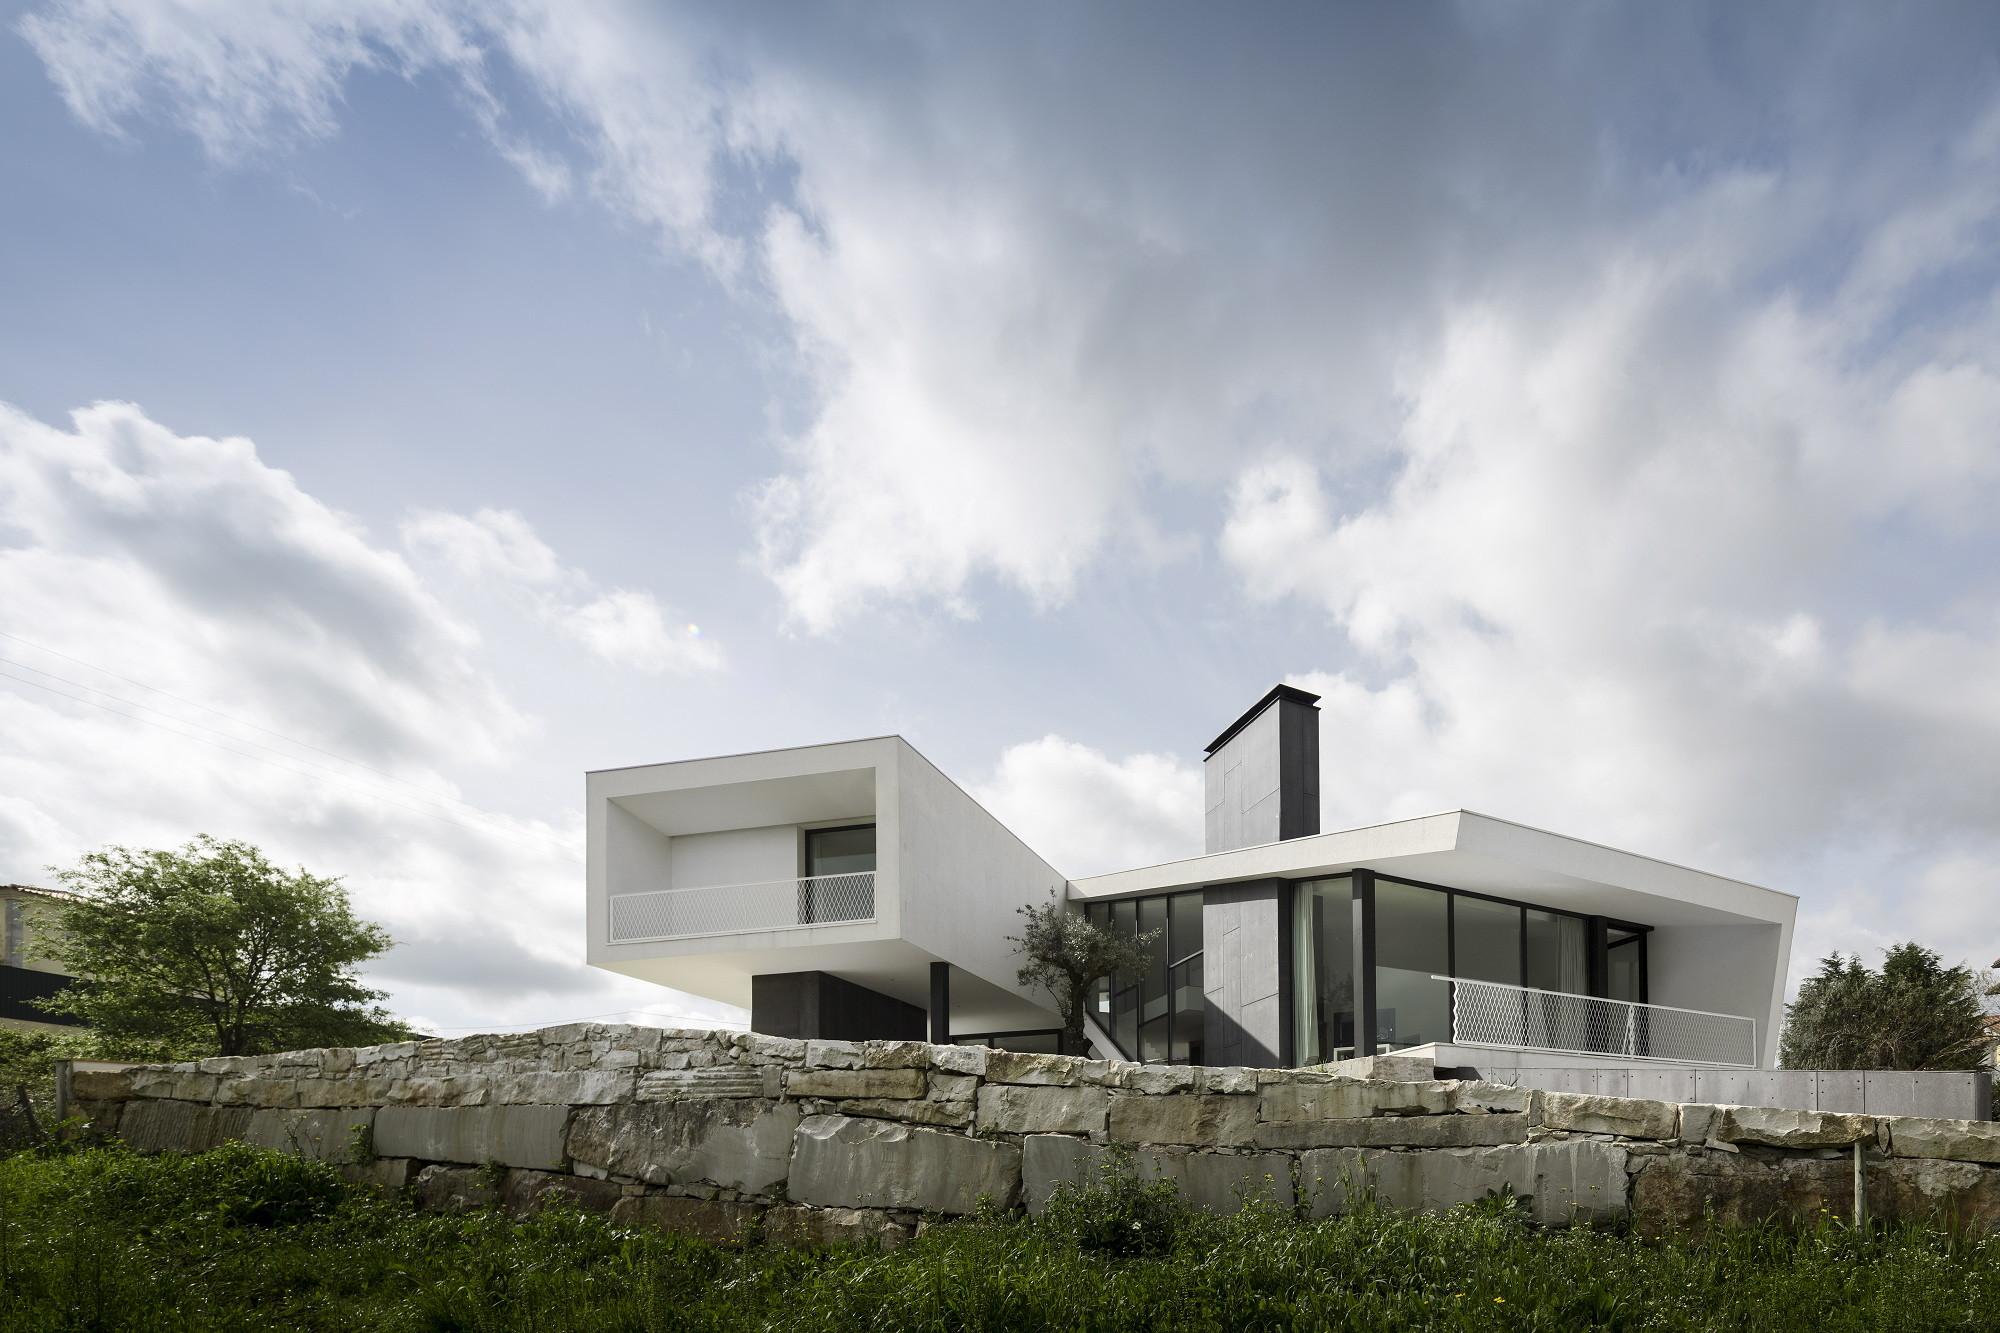 casa vidigal contaminar arquitectos plataforma